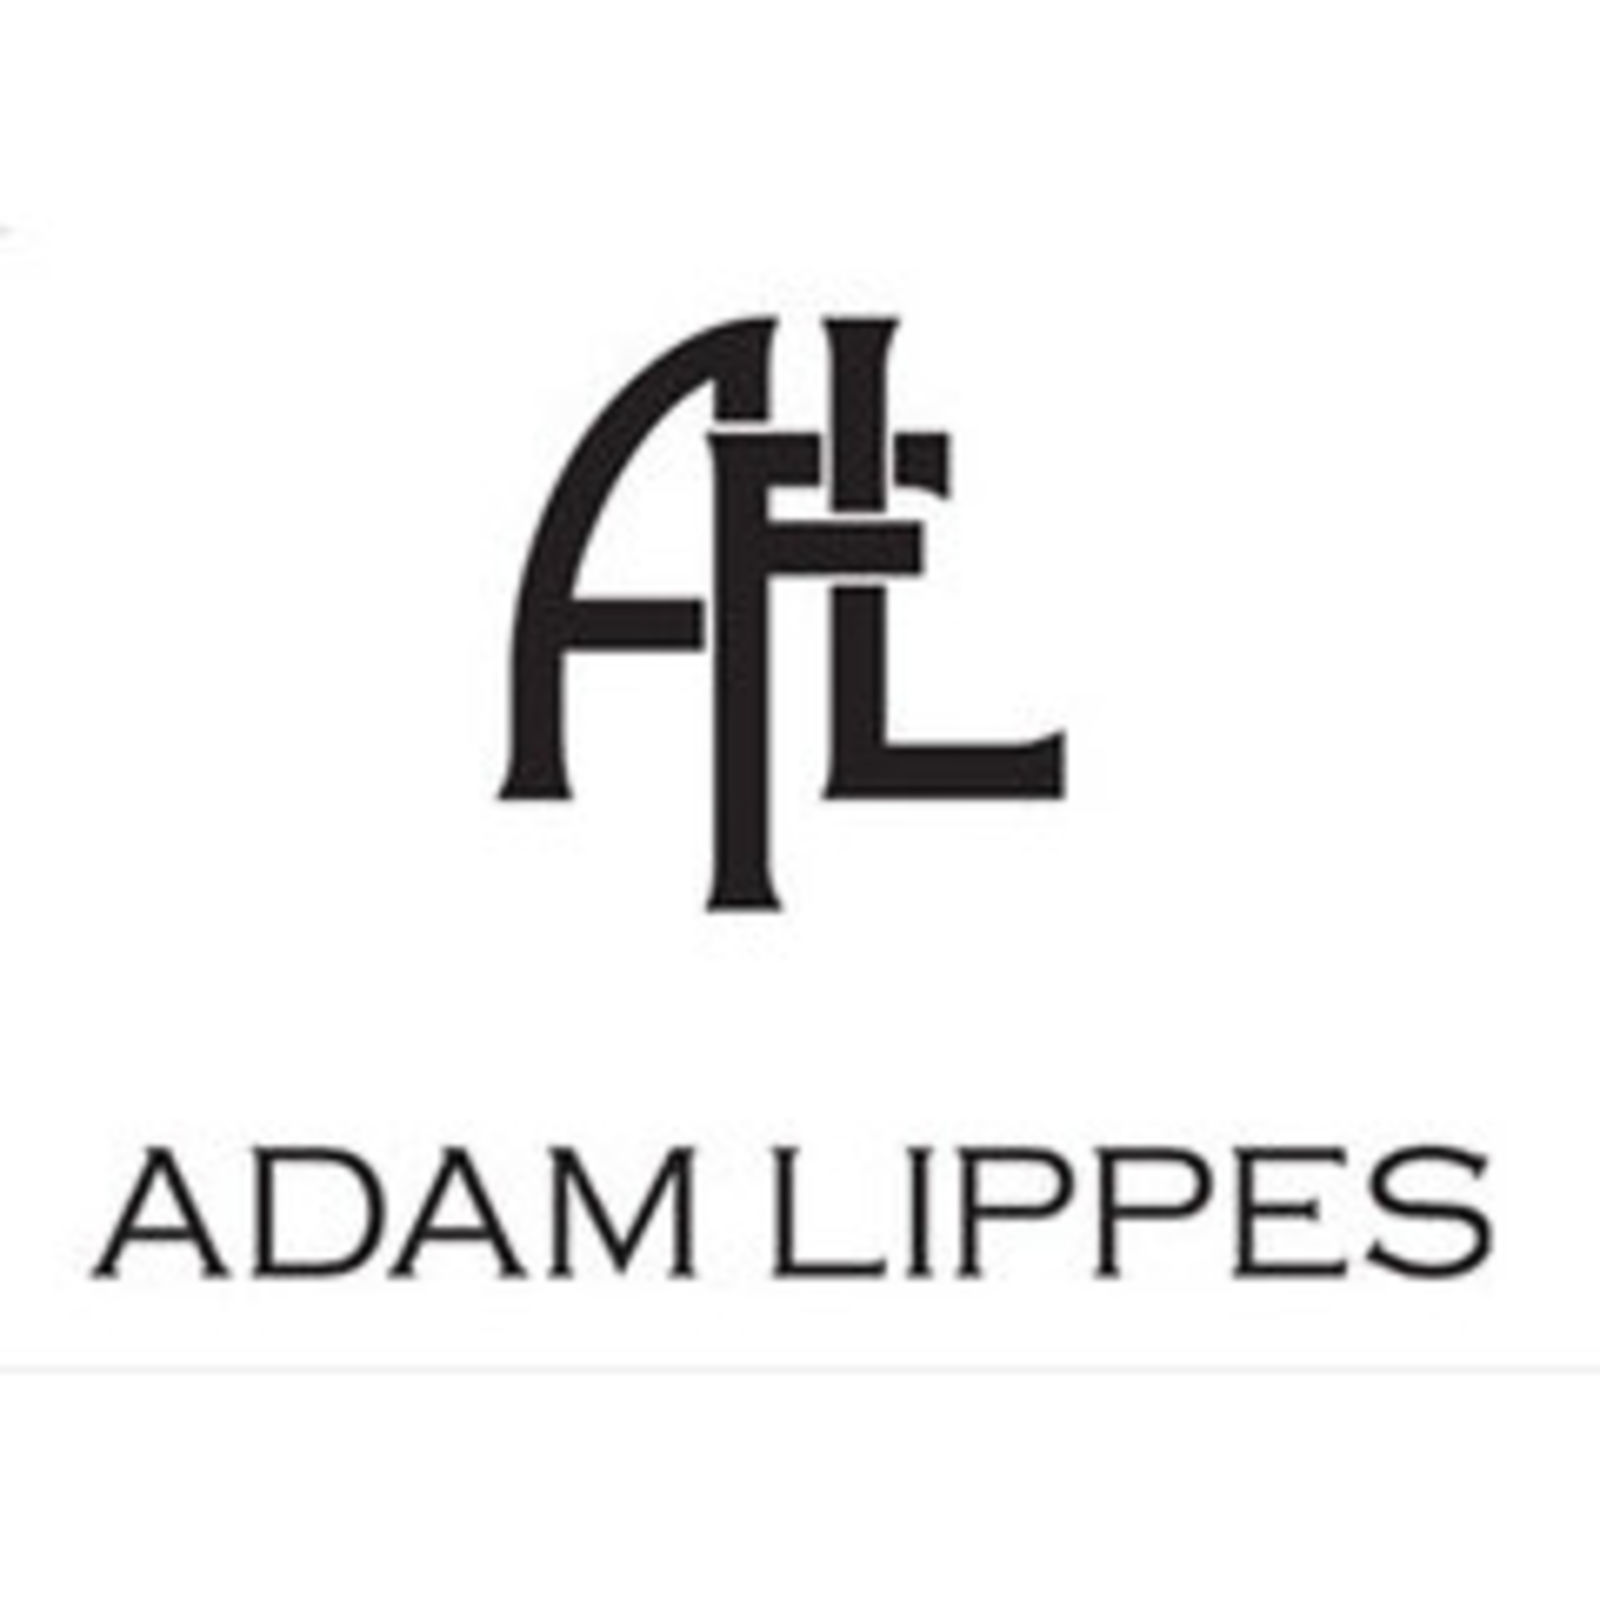 ADAM LIPPES